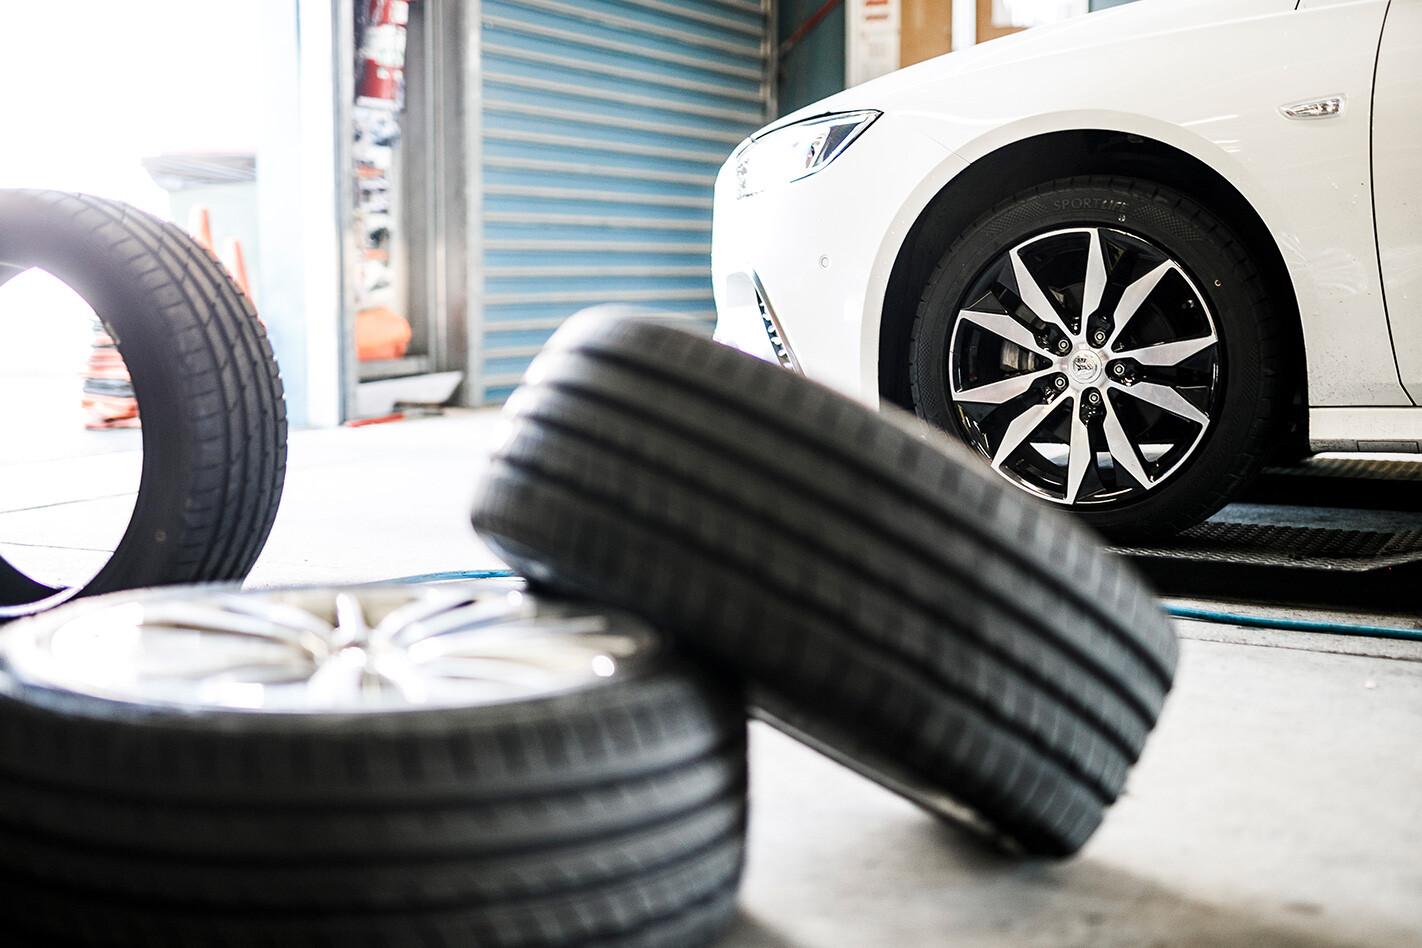 MOTOR Tyre Test 2015: The Verdict